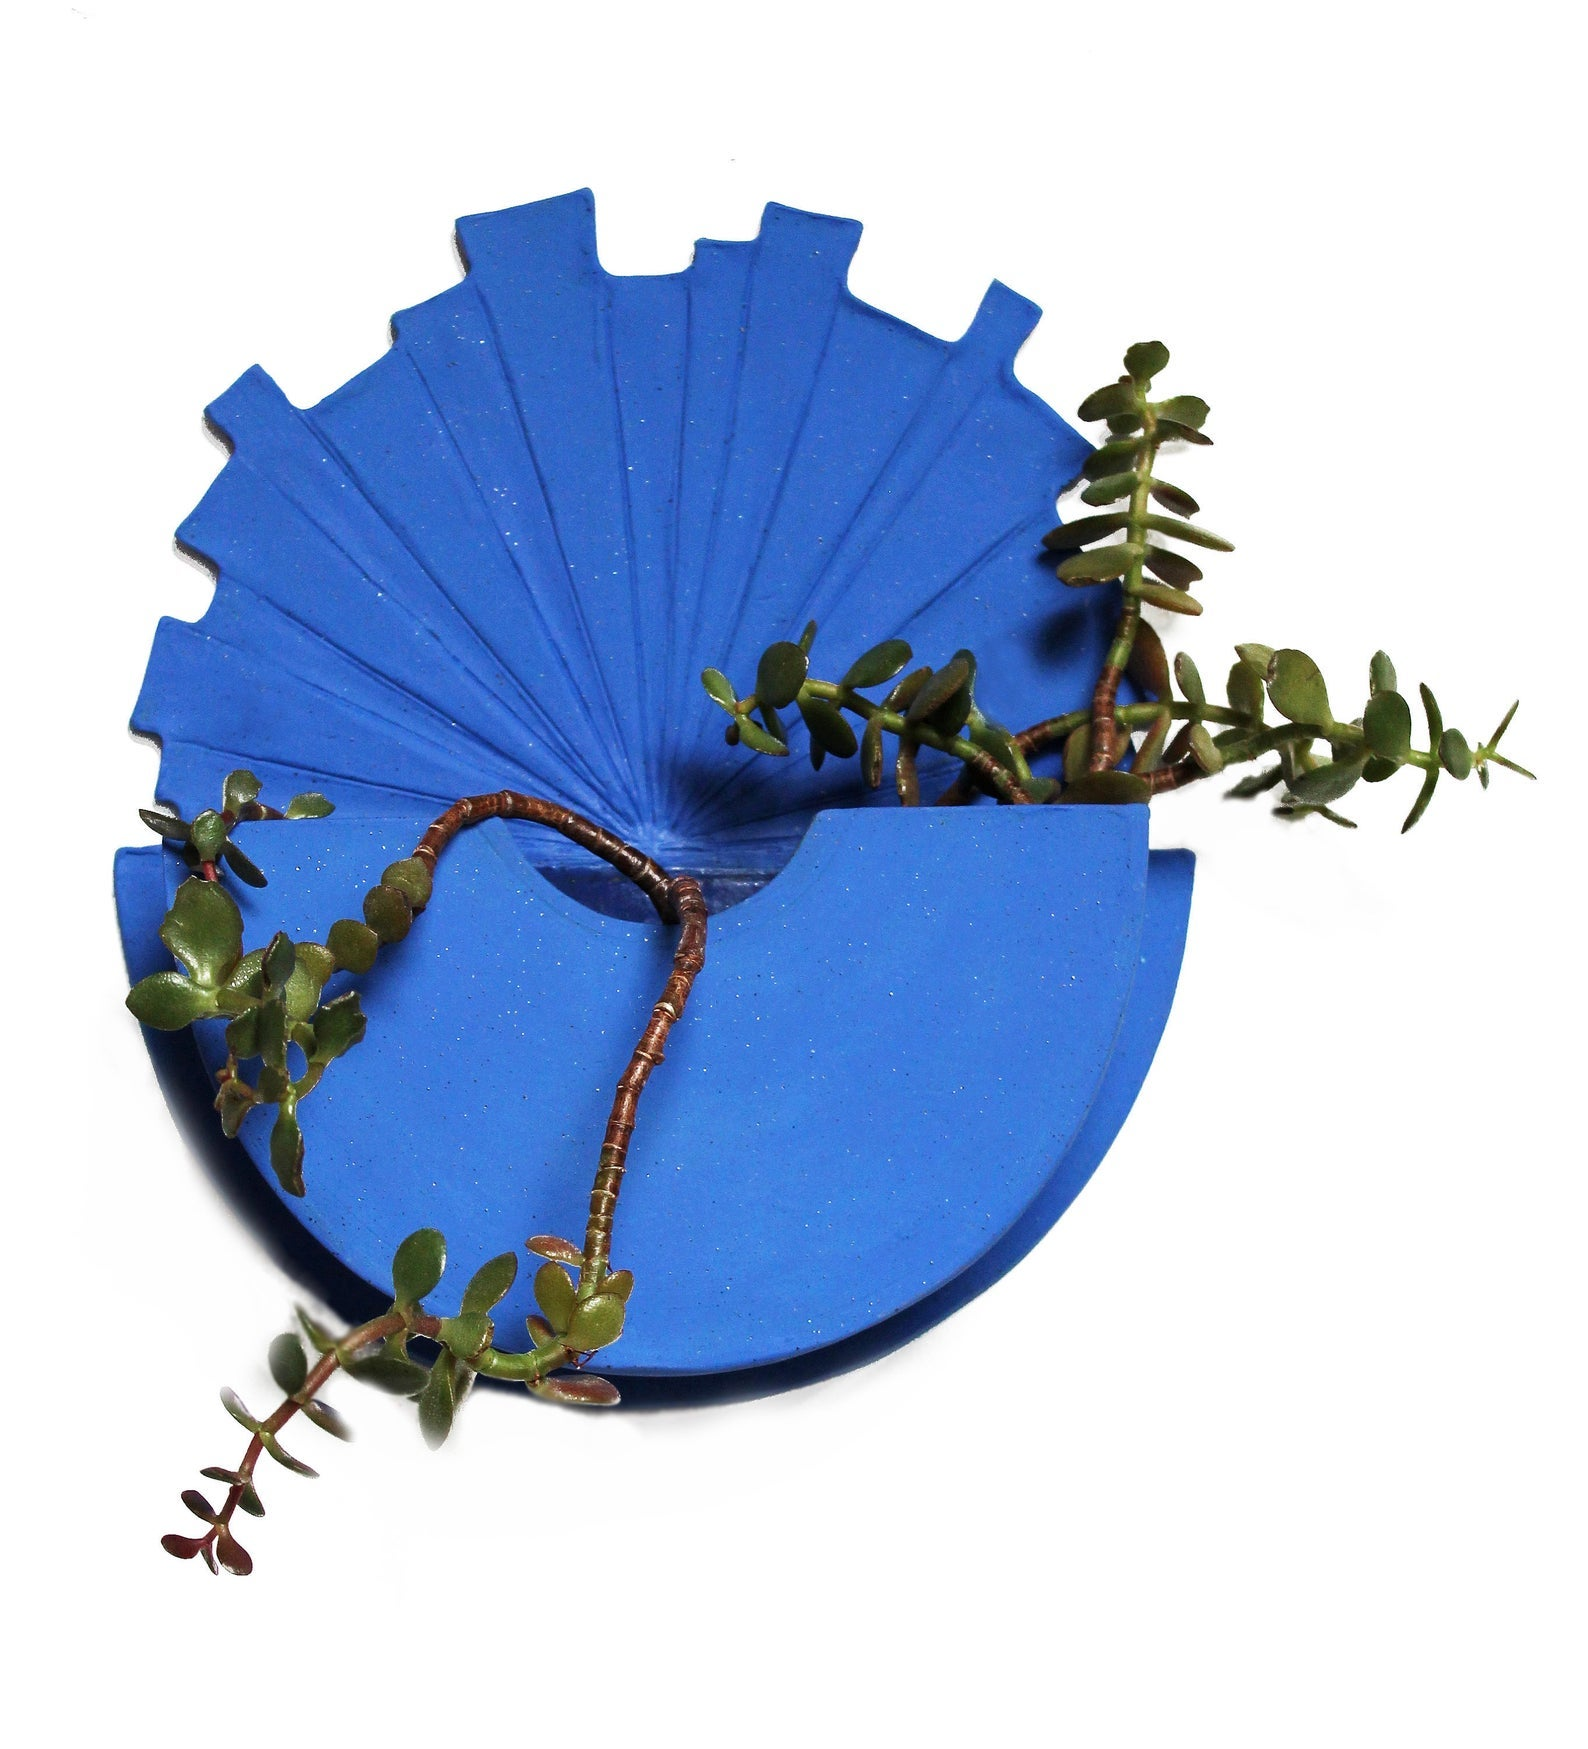 Wall Vessel Sculpture no.029 – Ceramic Planter in Electric Blue